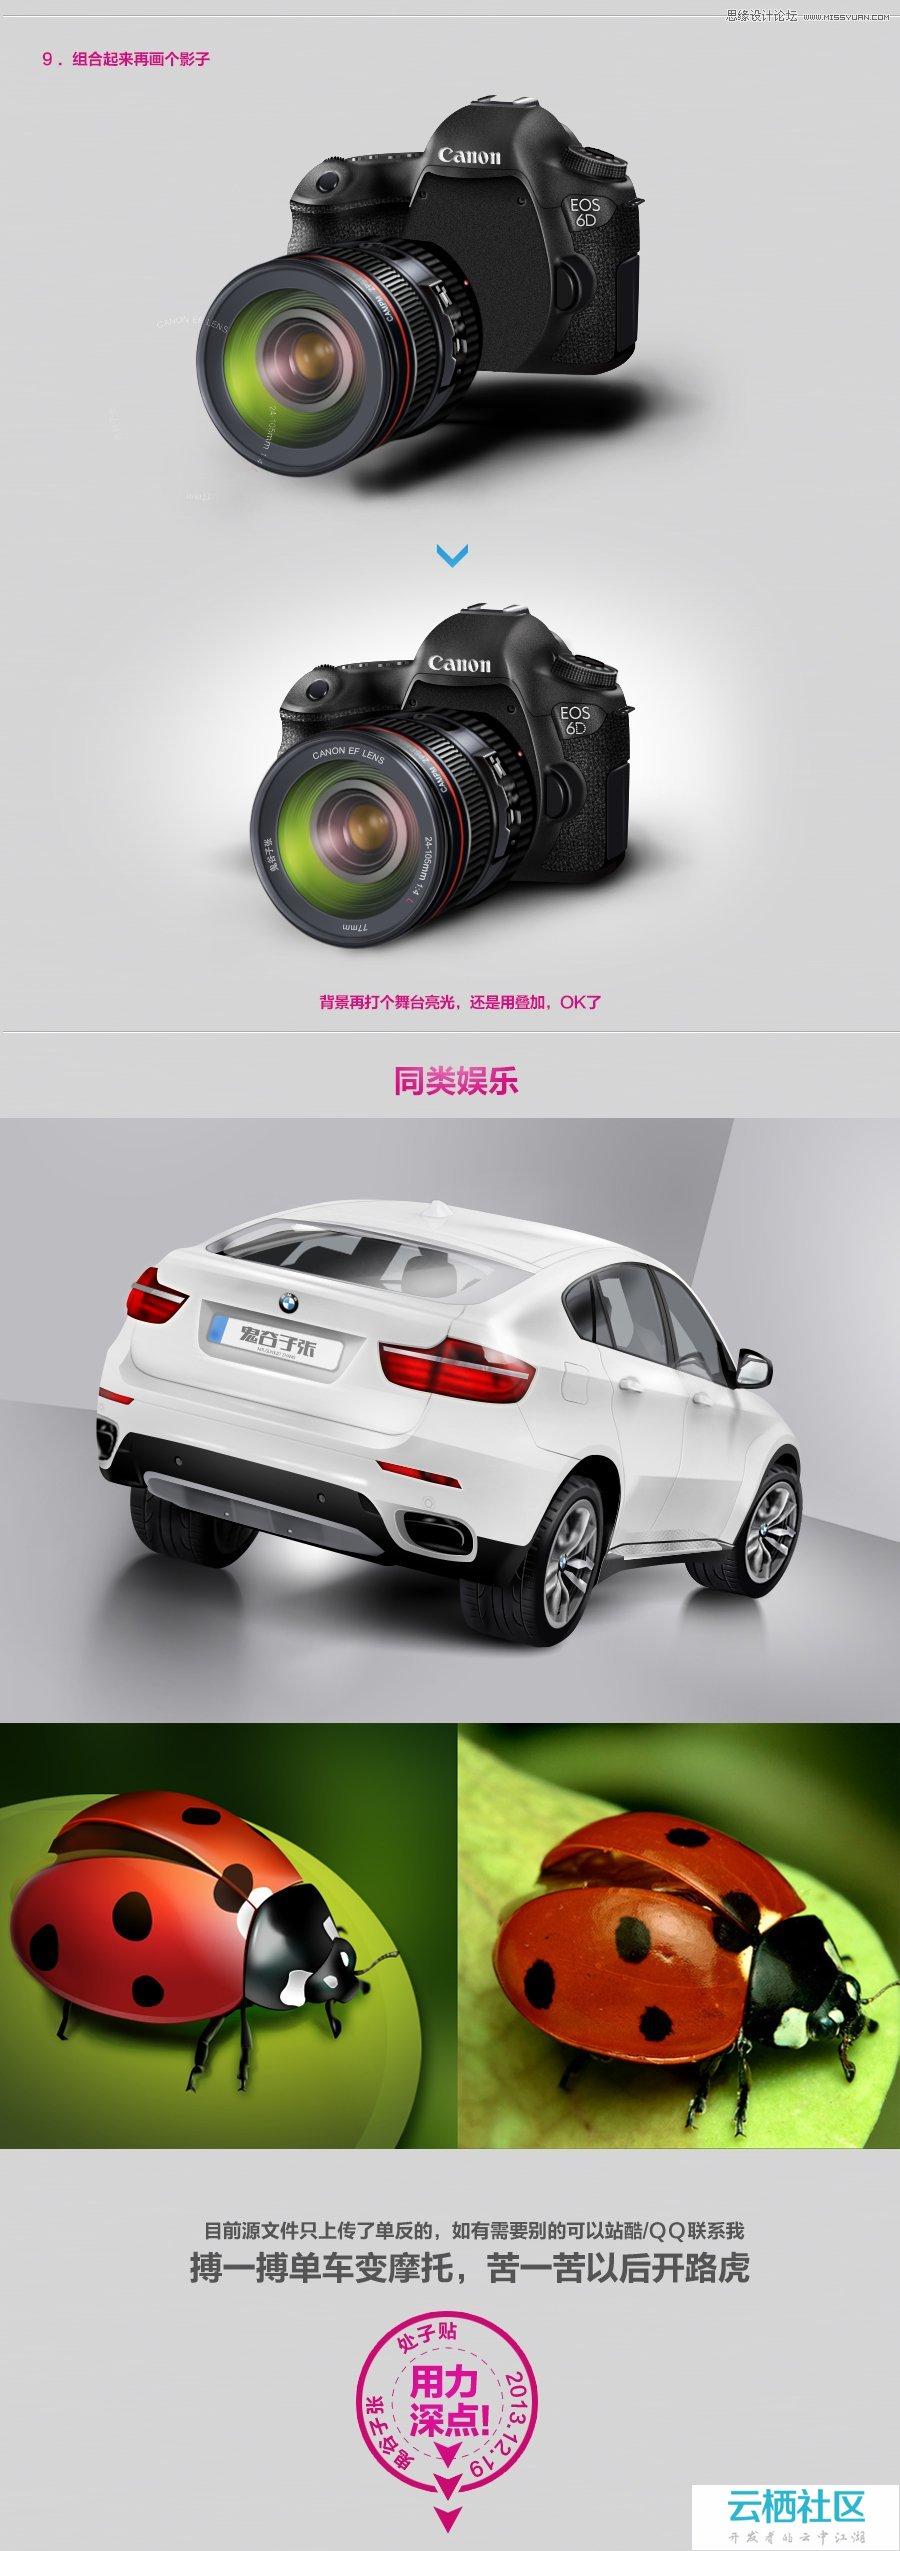 Photoshop绘制逼真的佳能6D单反相机教程-ai绘制逼真人像教程